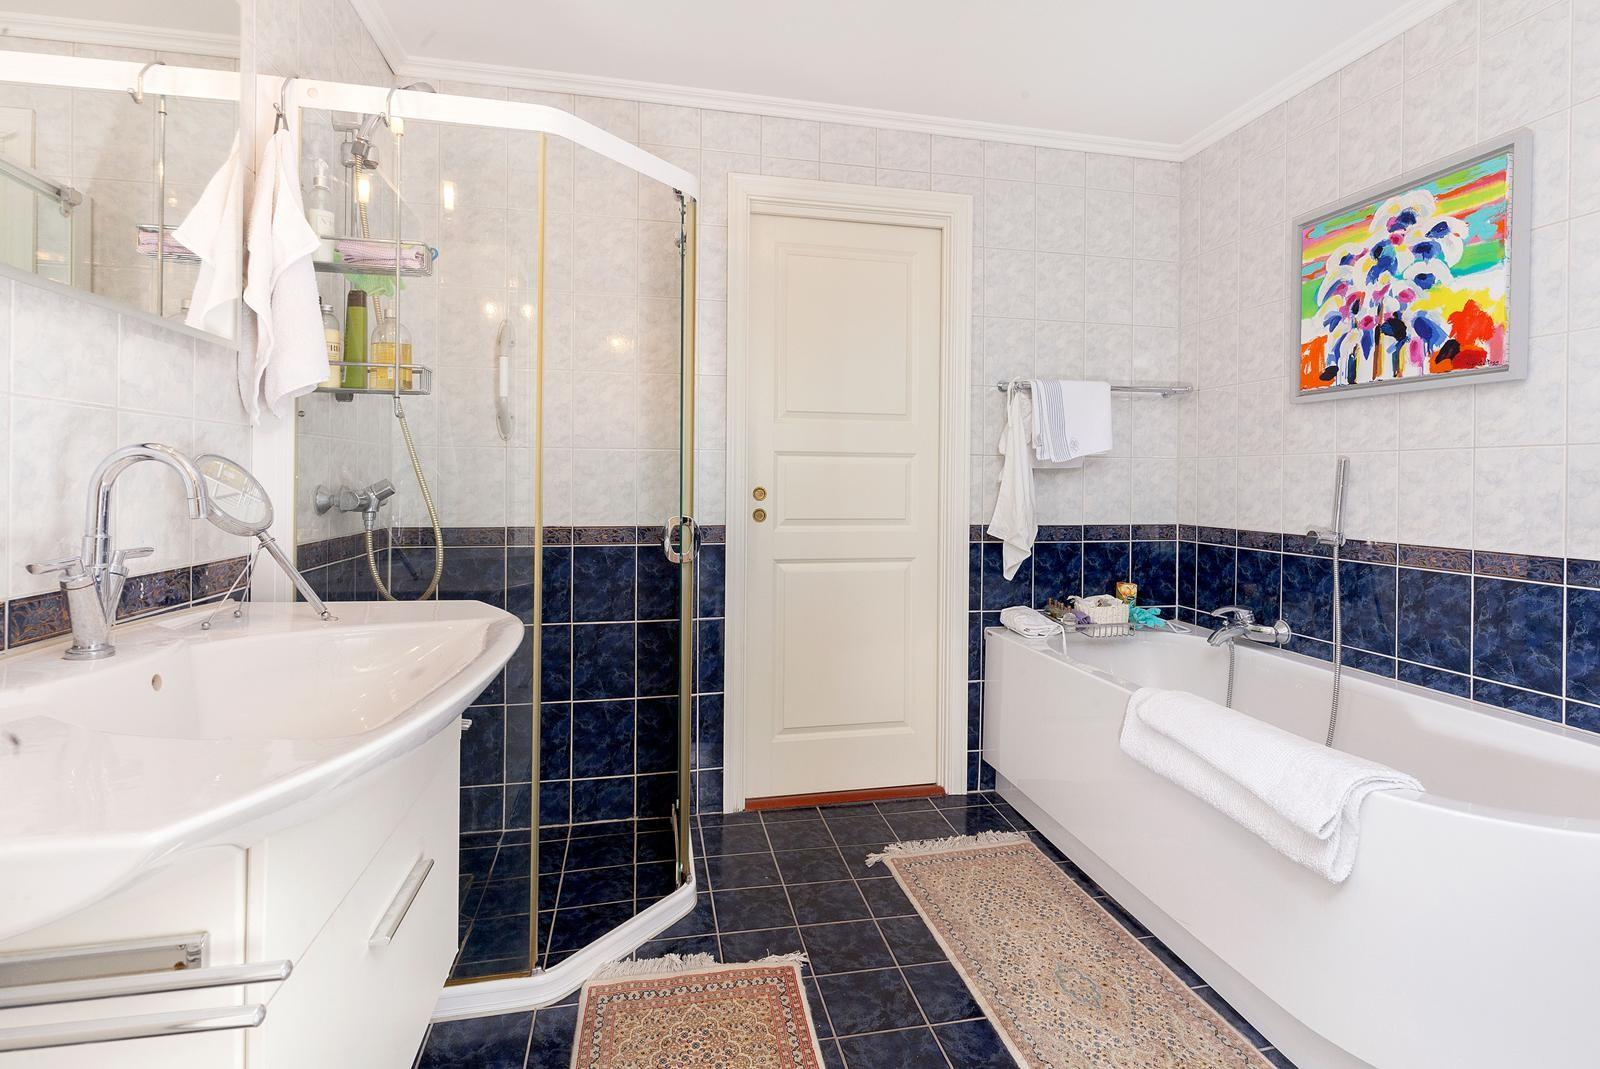 stort-fliselagt-bad-med-badekar-dusjkabinett-og-varmekabler